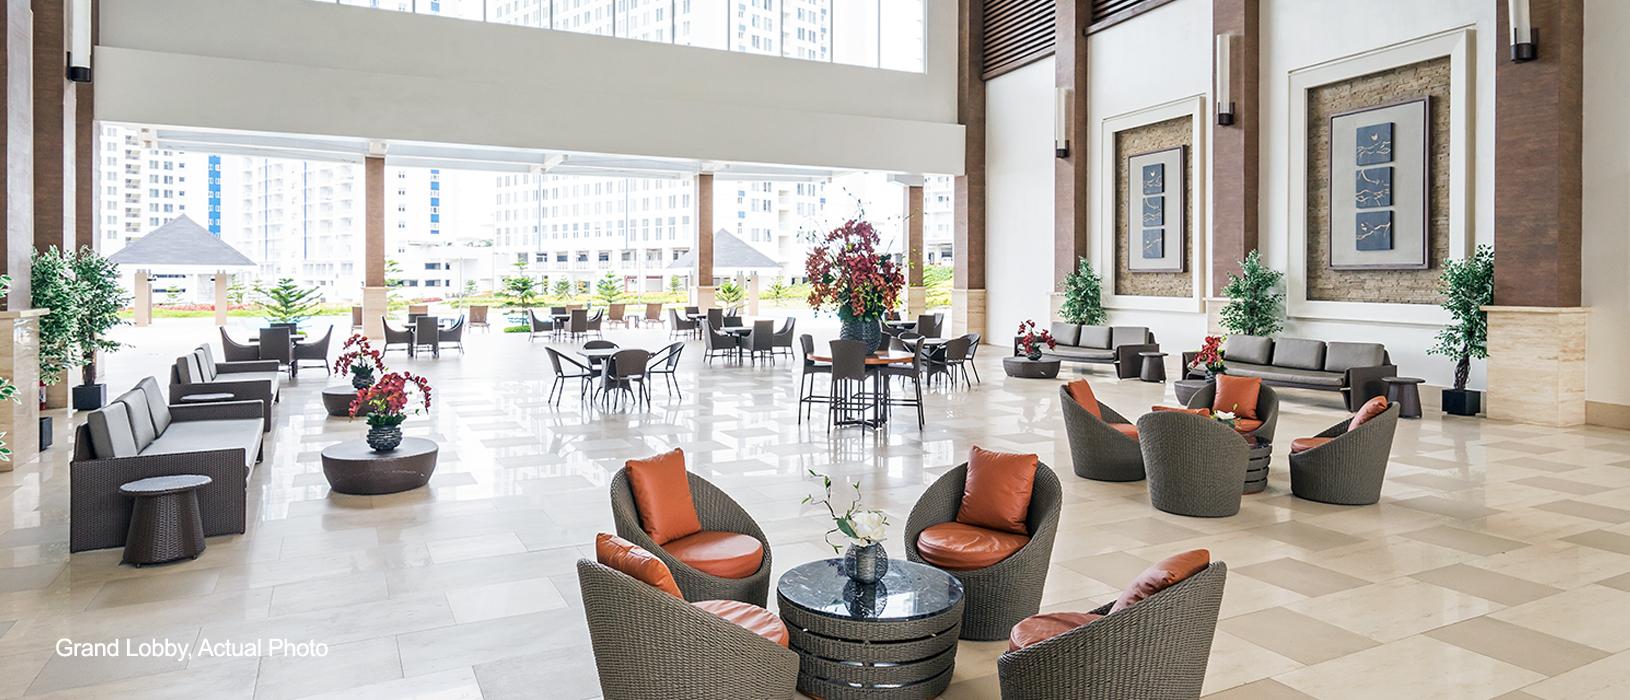 Wind Residences Grand lobby